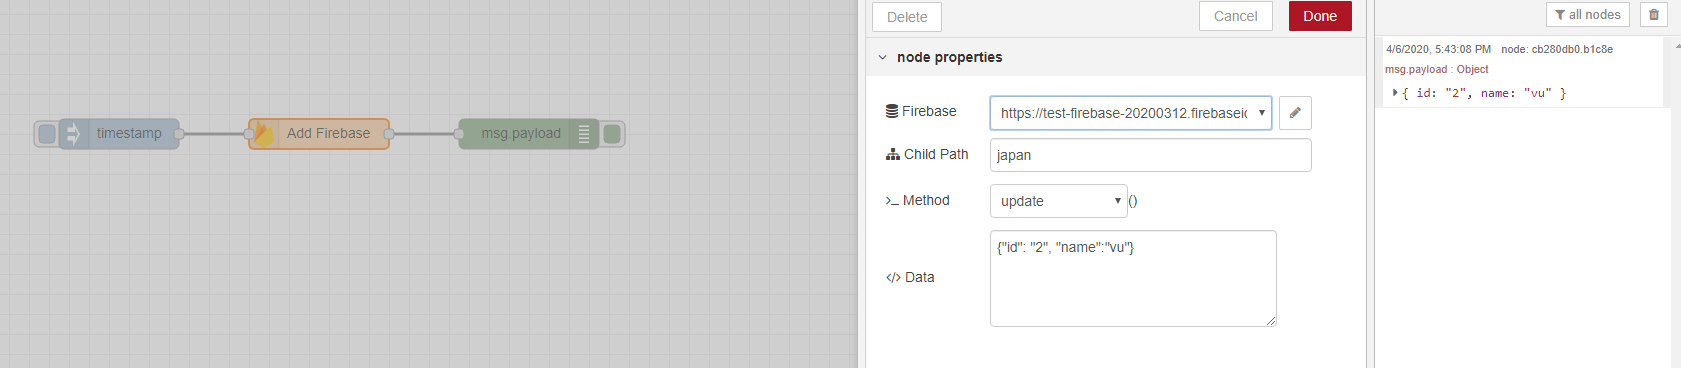 update-node